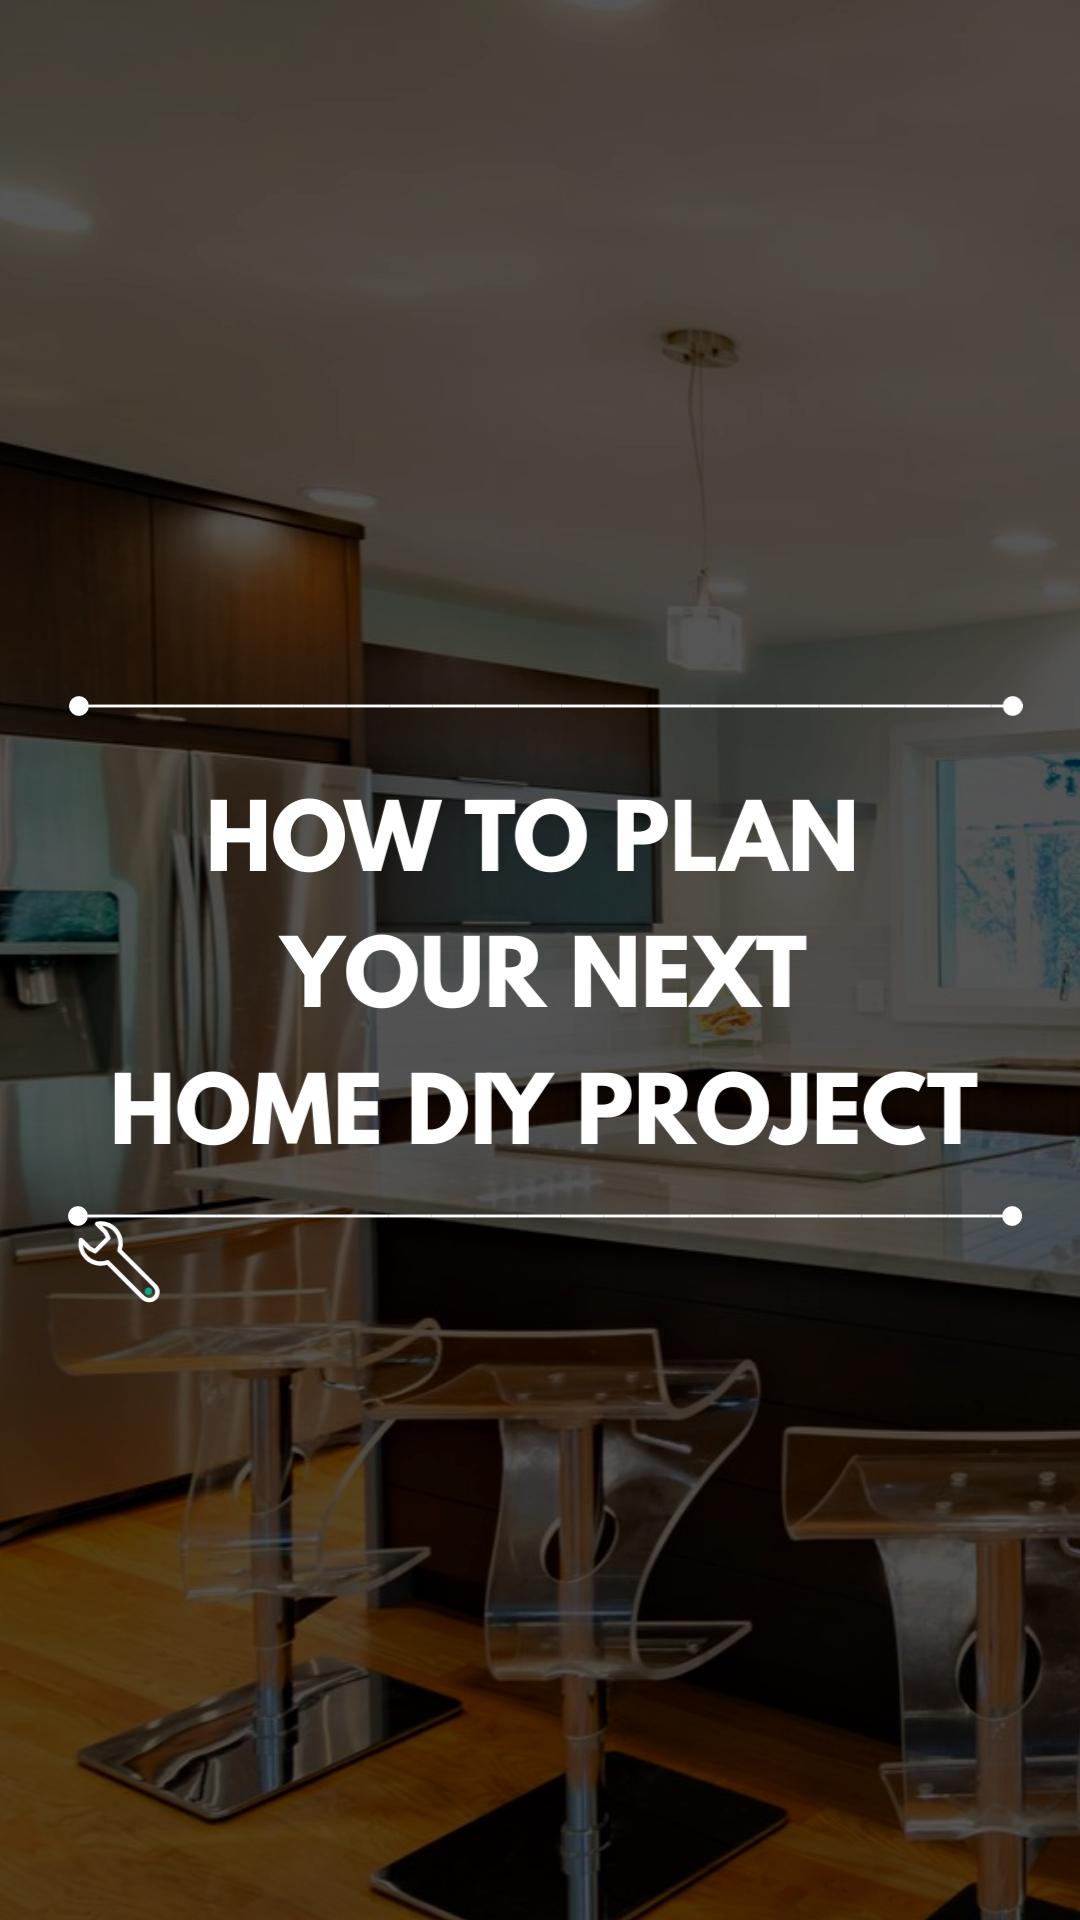 Plan Your Next Home DIY Vertical Template